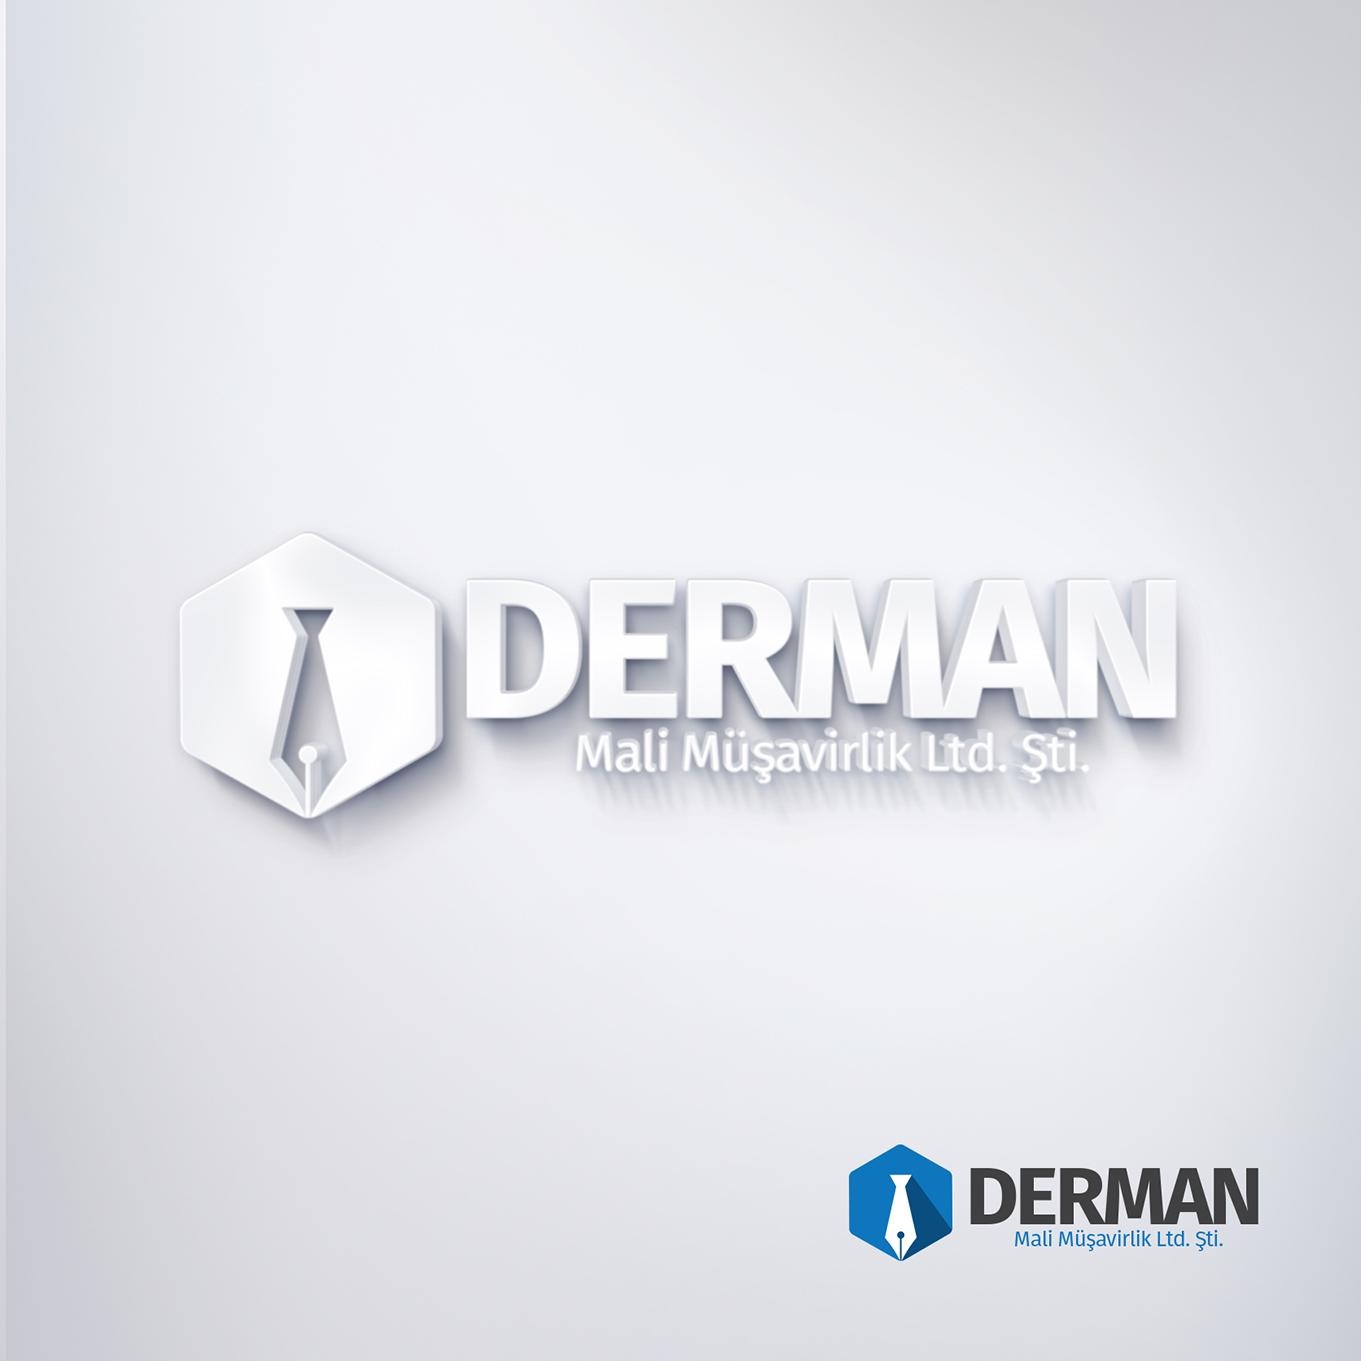 derman-mali-müsavirlik-logo-tasarimi